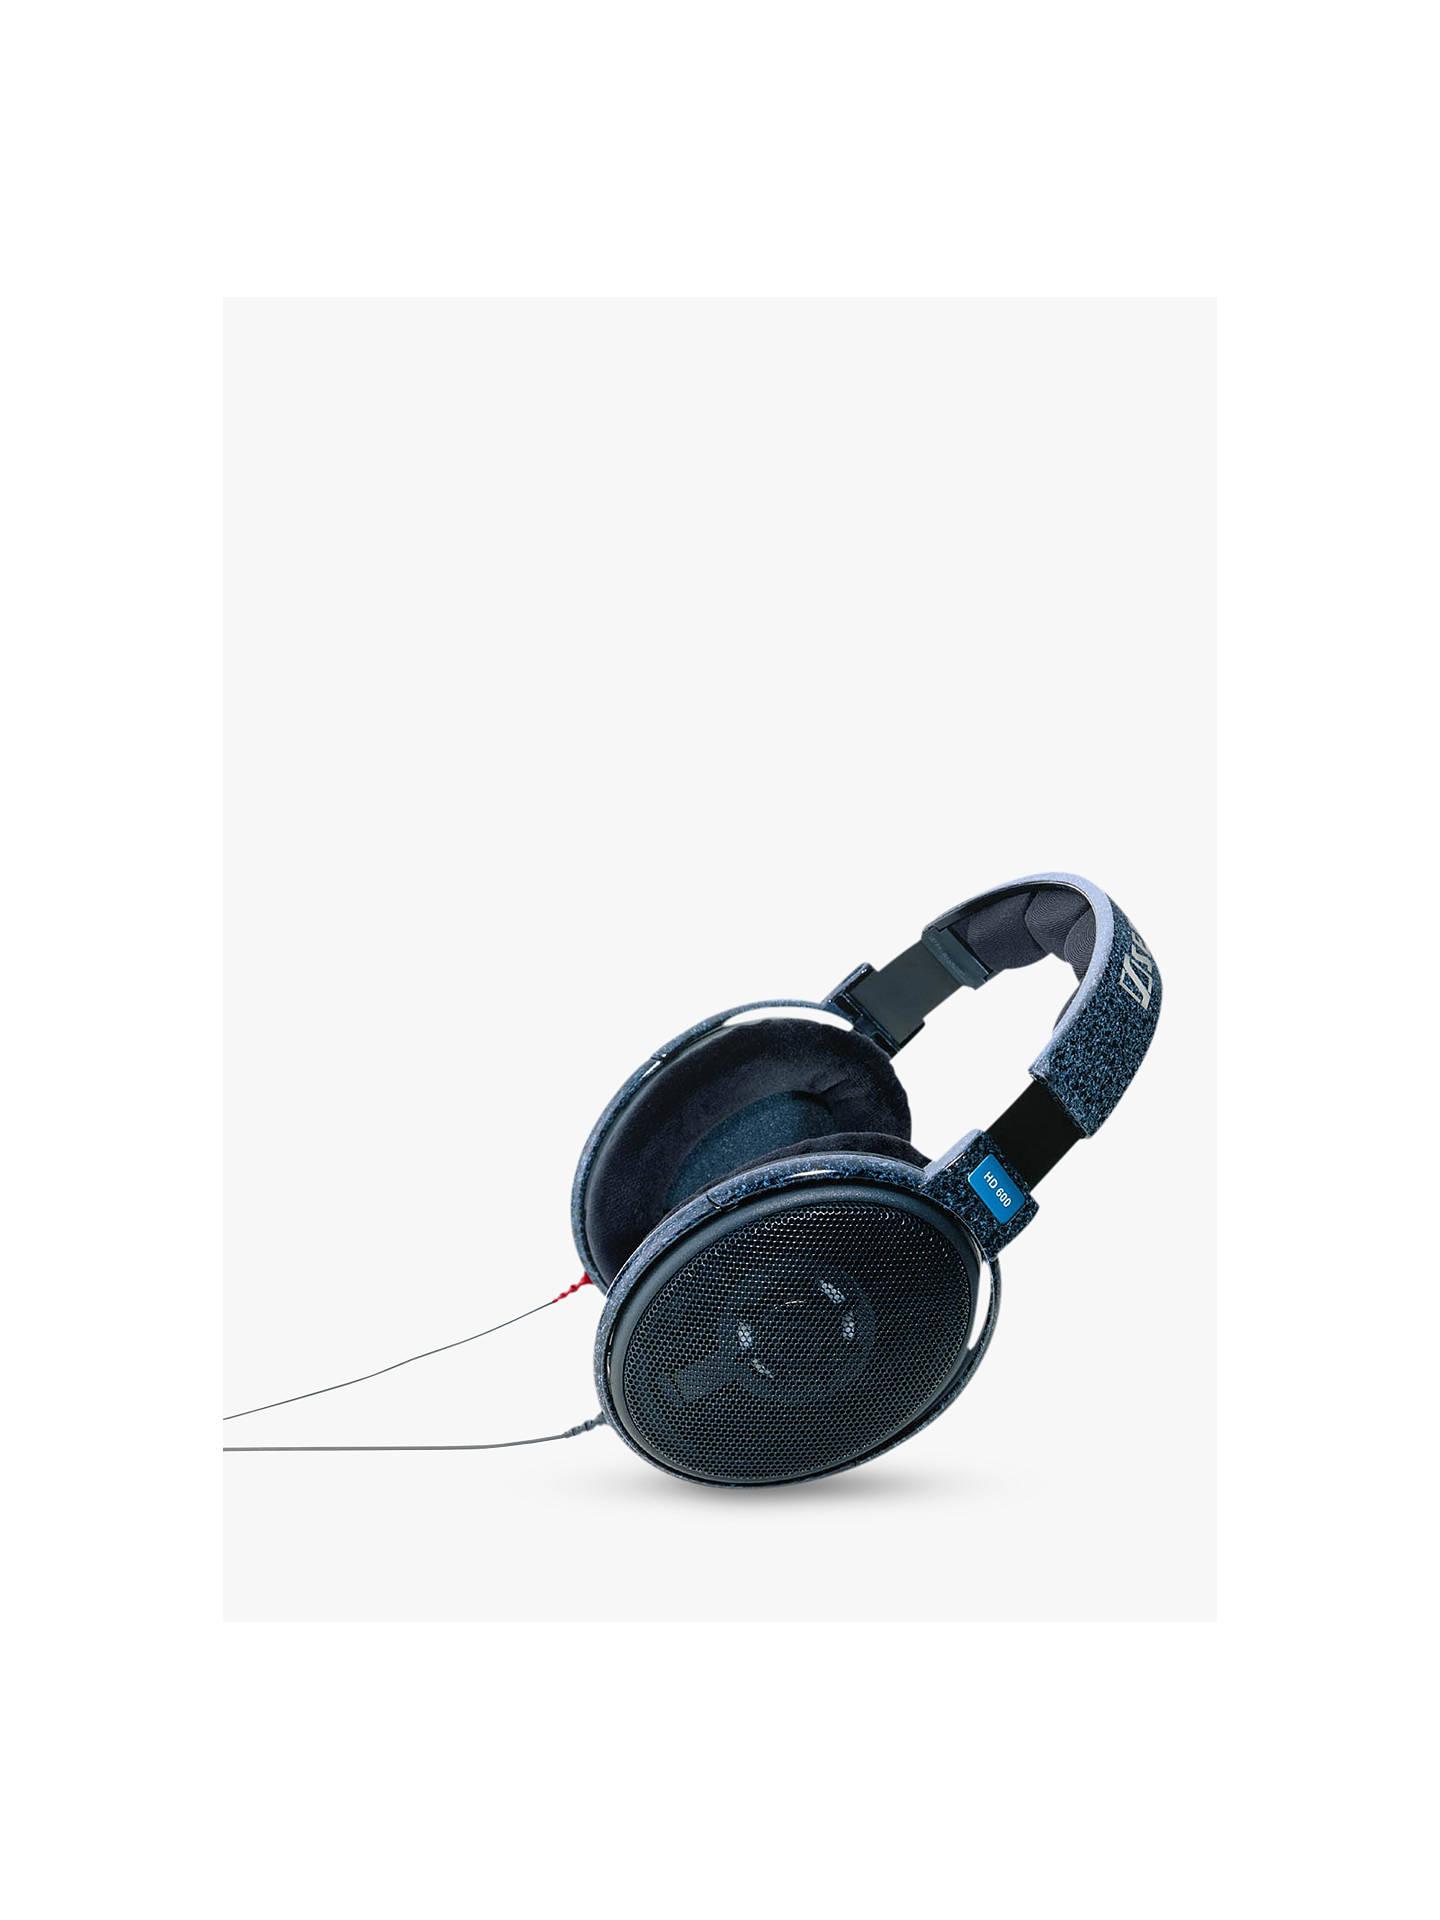 sennheiser hd 600 full size headphones black at john lewis partners. Black Bedroom Furniture Sets. Home Design Ideas